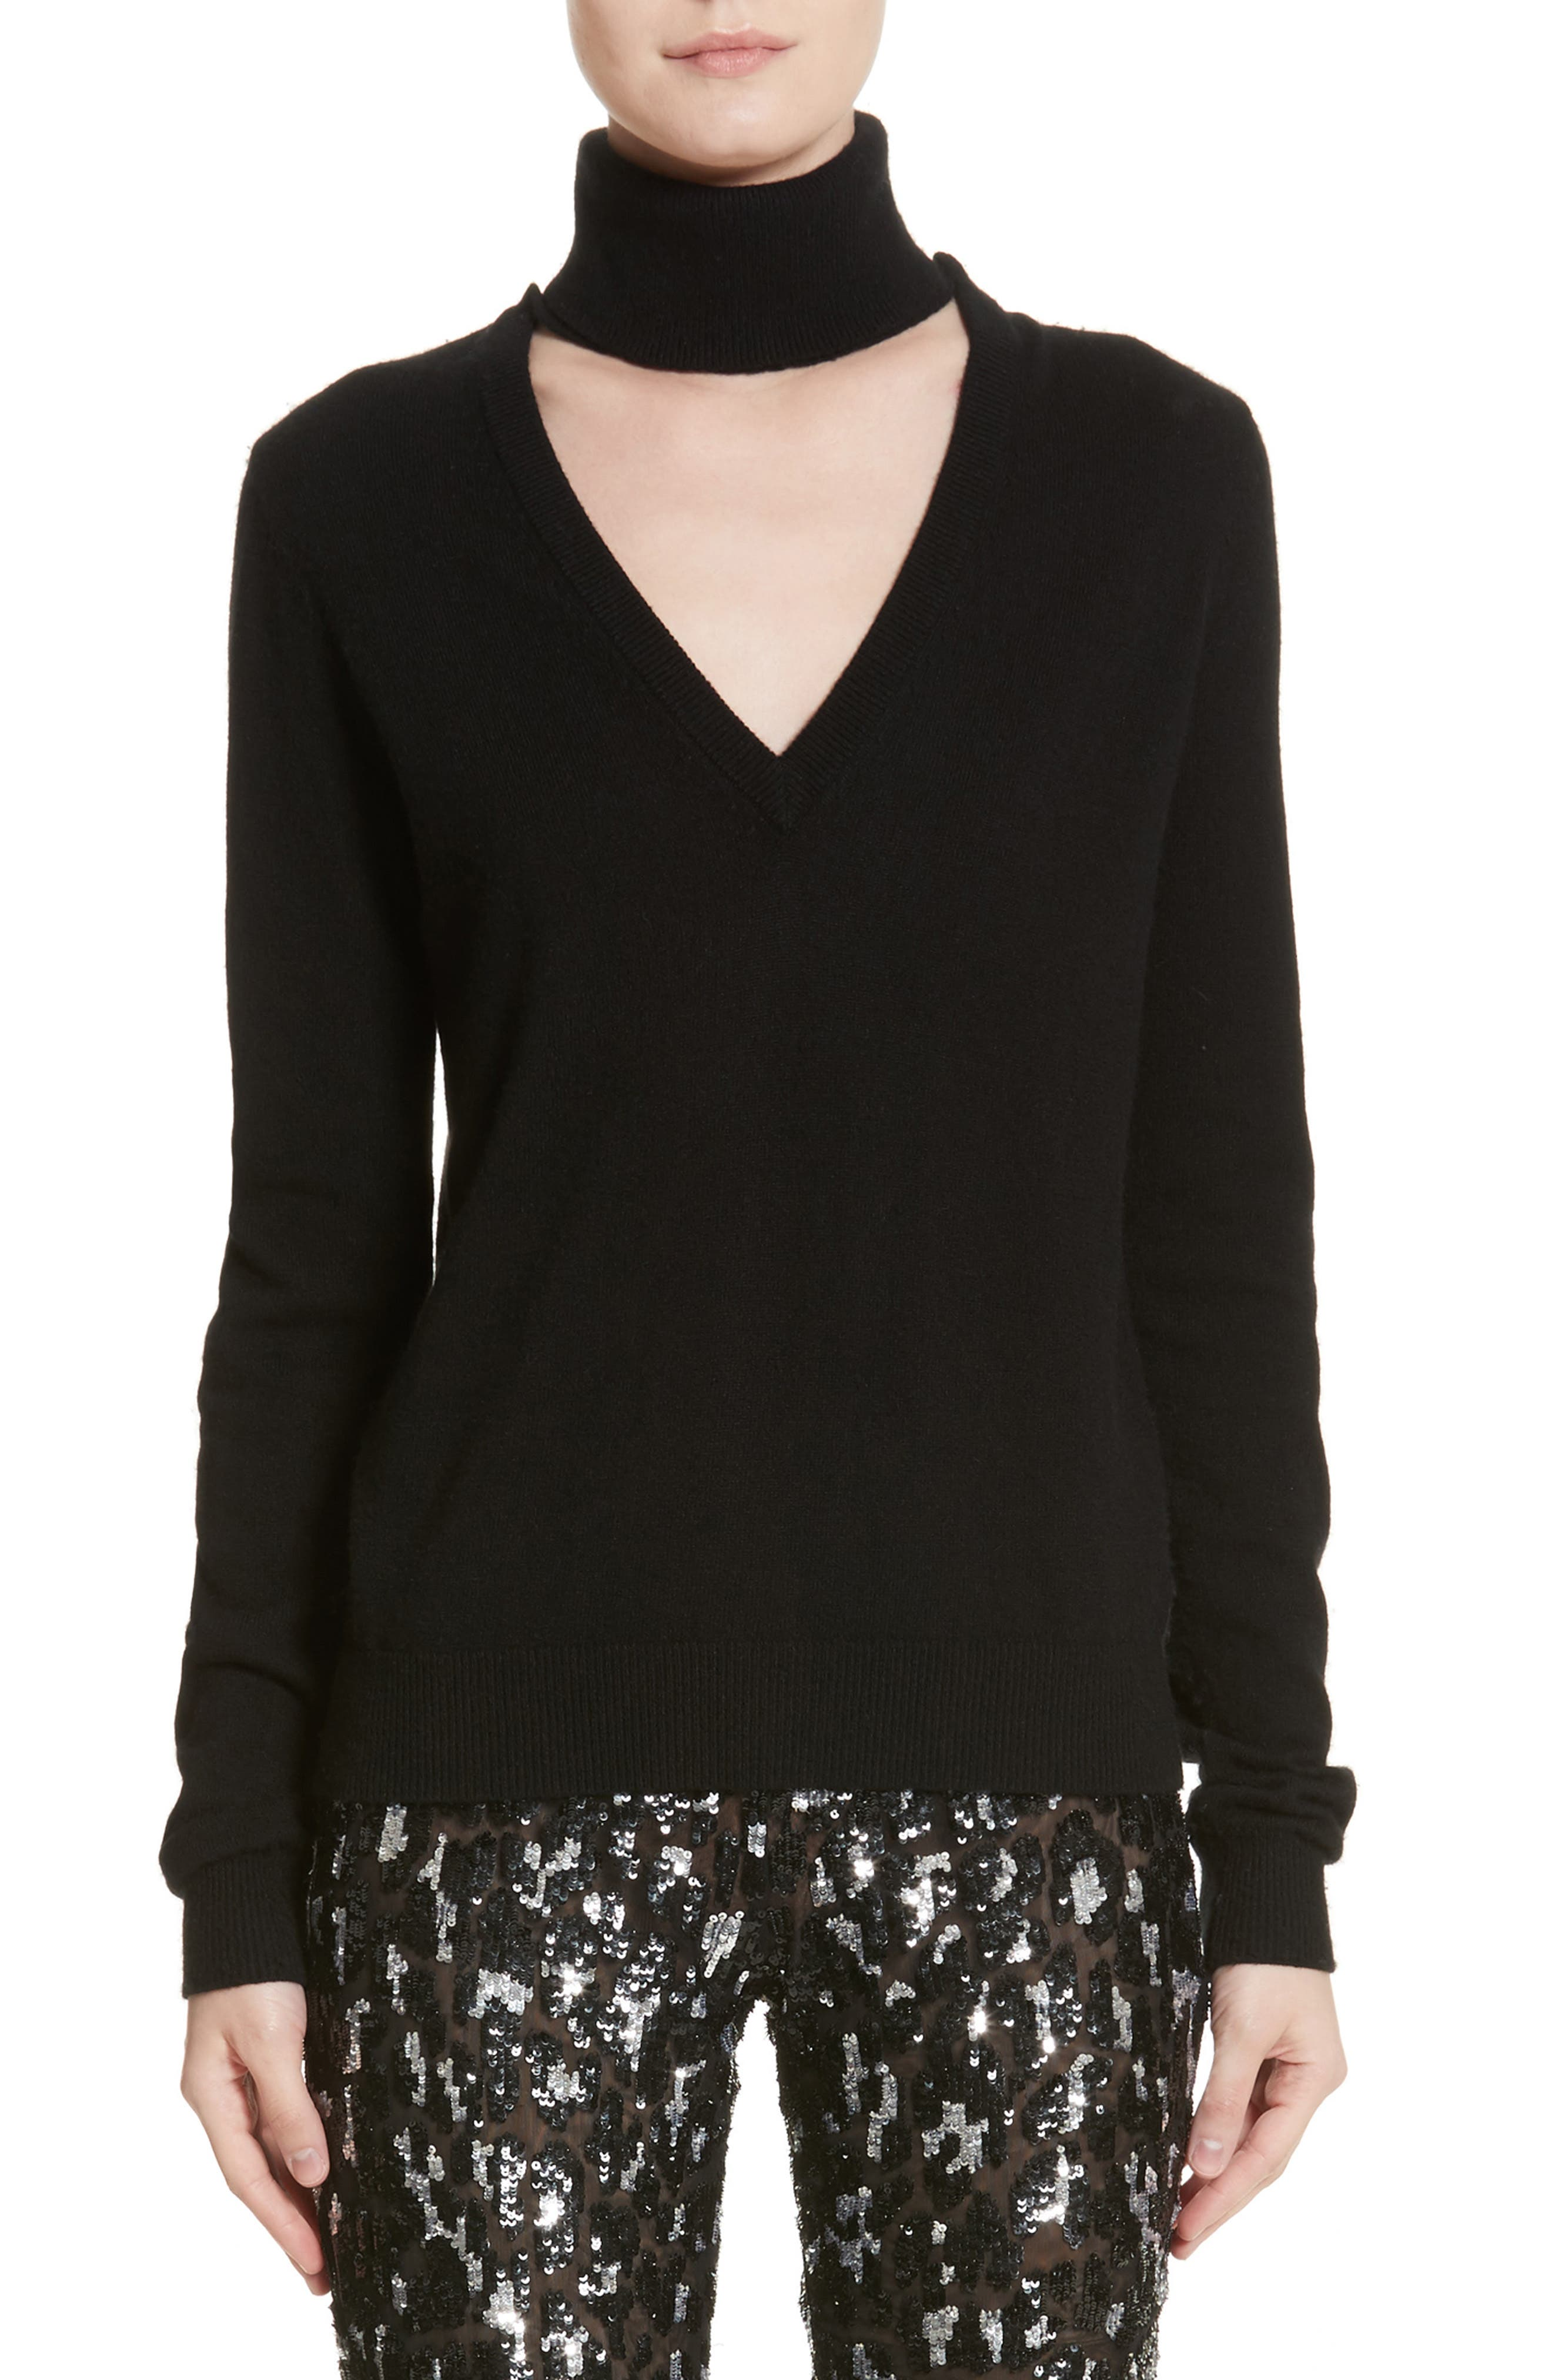 Michael Kors Cutout Turtleneck Cashmere Sweater